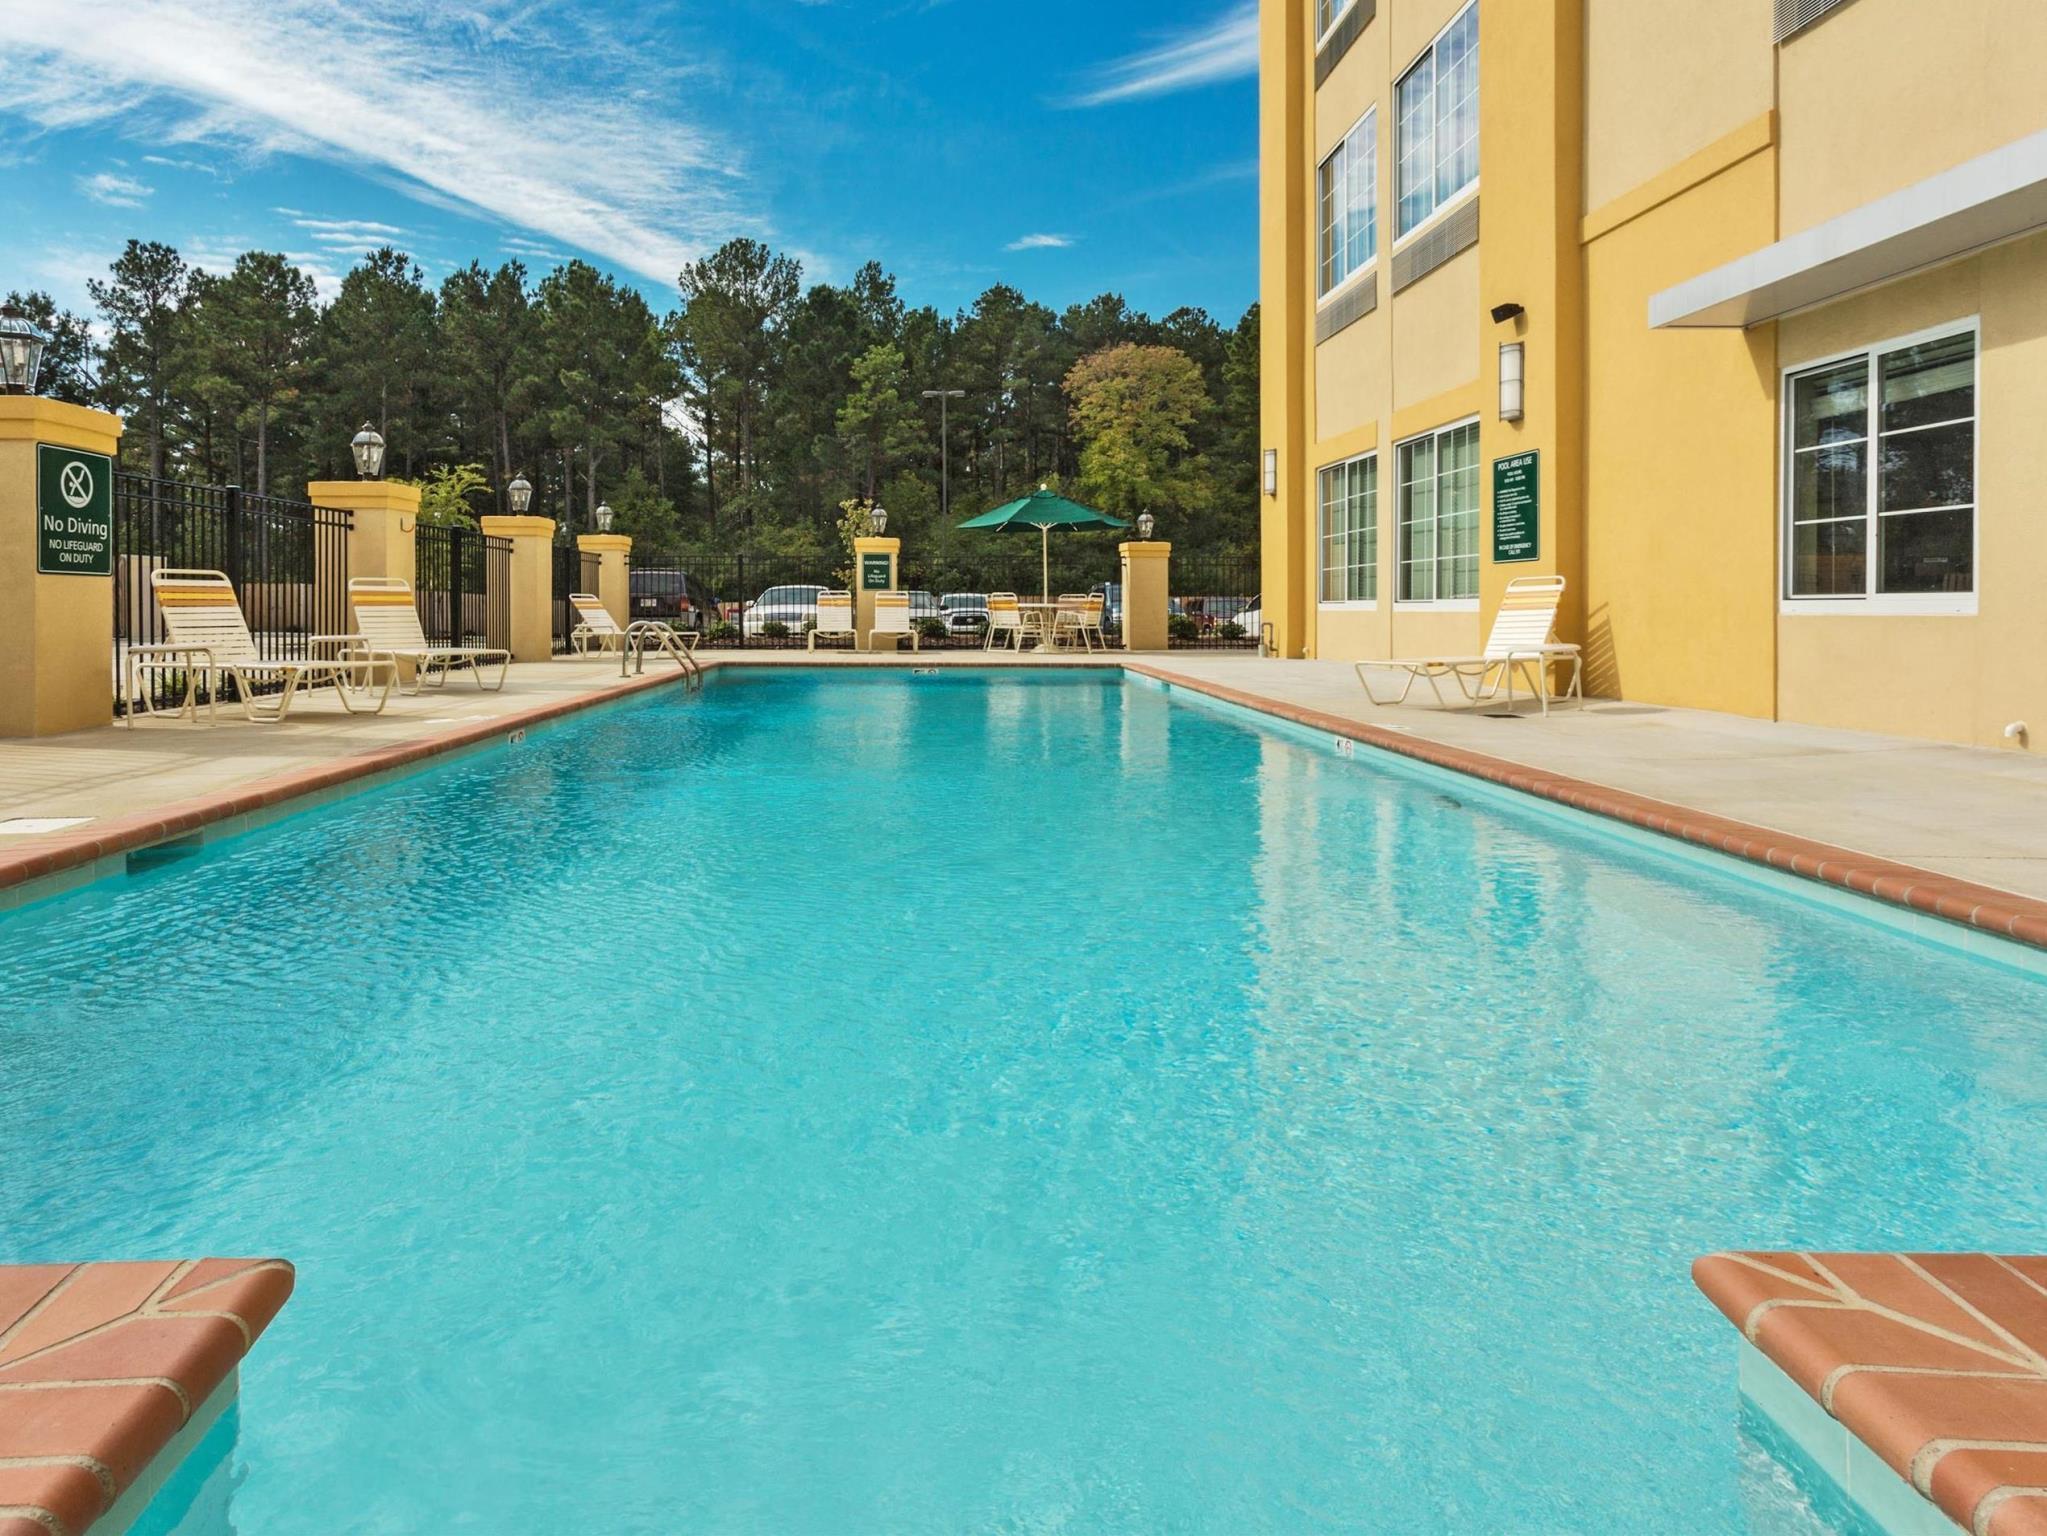 La Quinta Inn And Suites By Wyndham Starkville At MSU